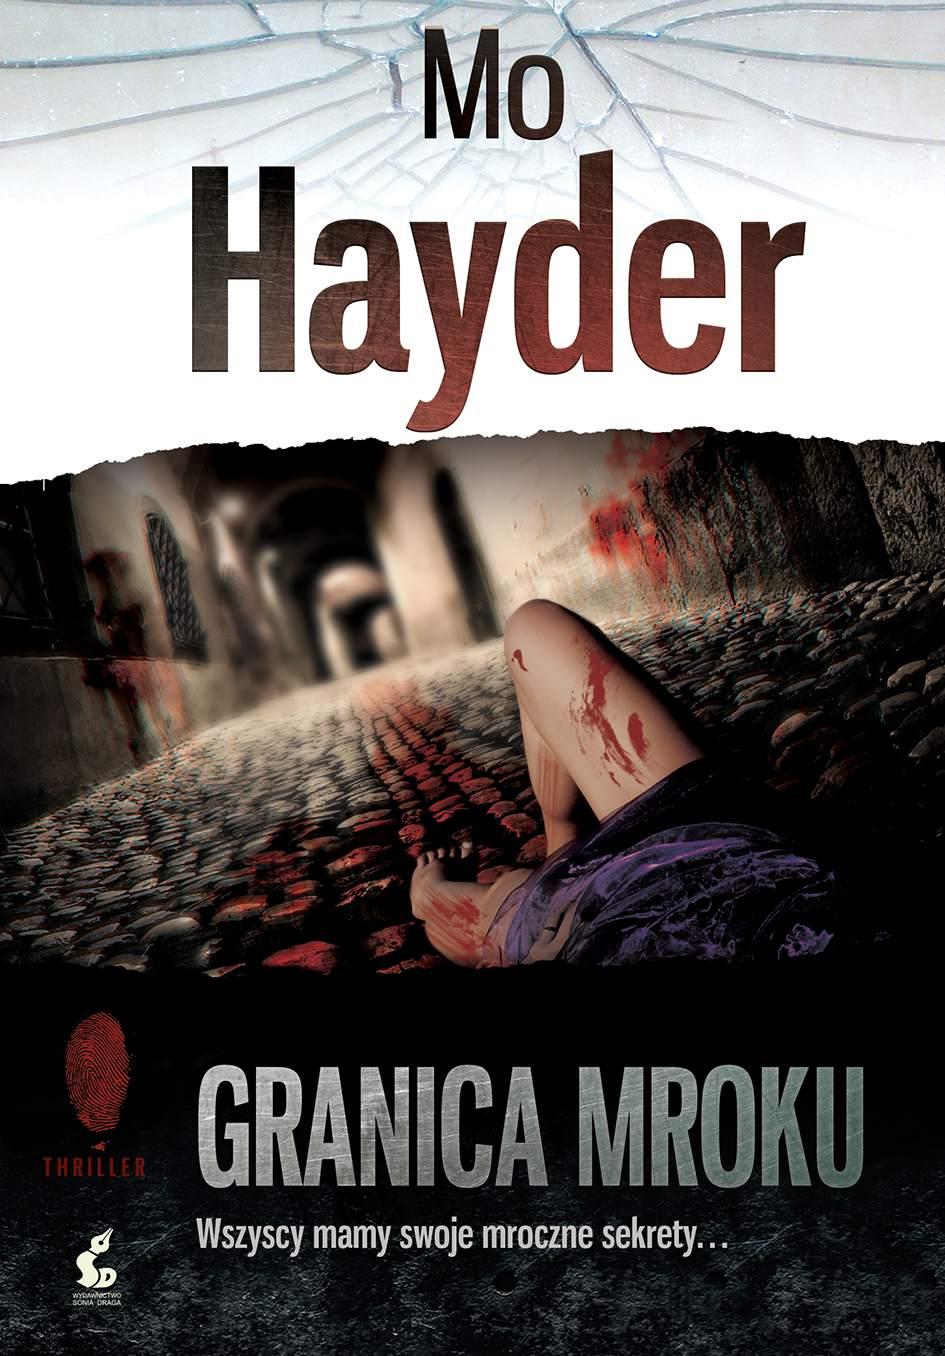 Granica mroku - Ebook (Książka na Kindle) do pobrania w formacie MOBI